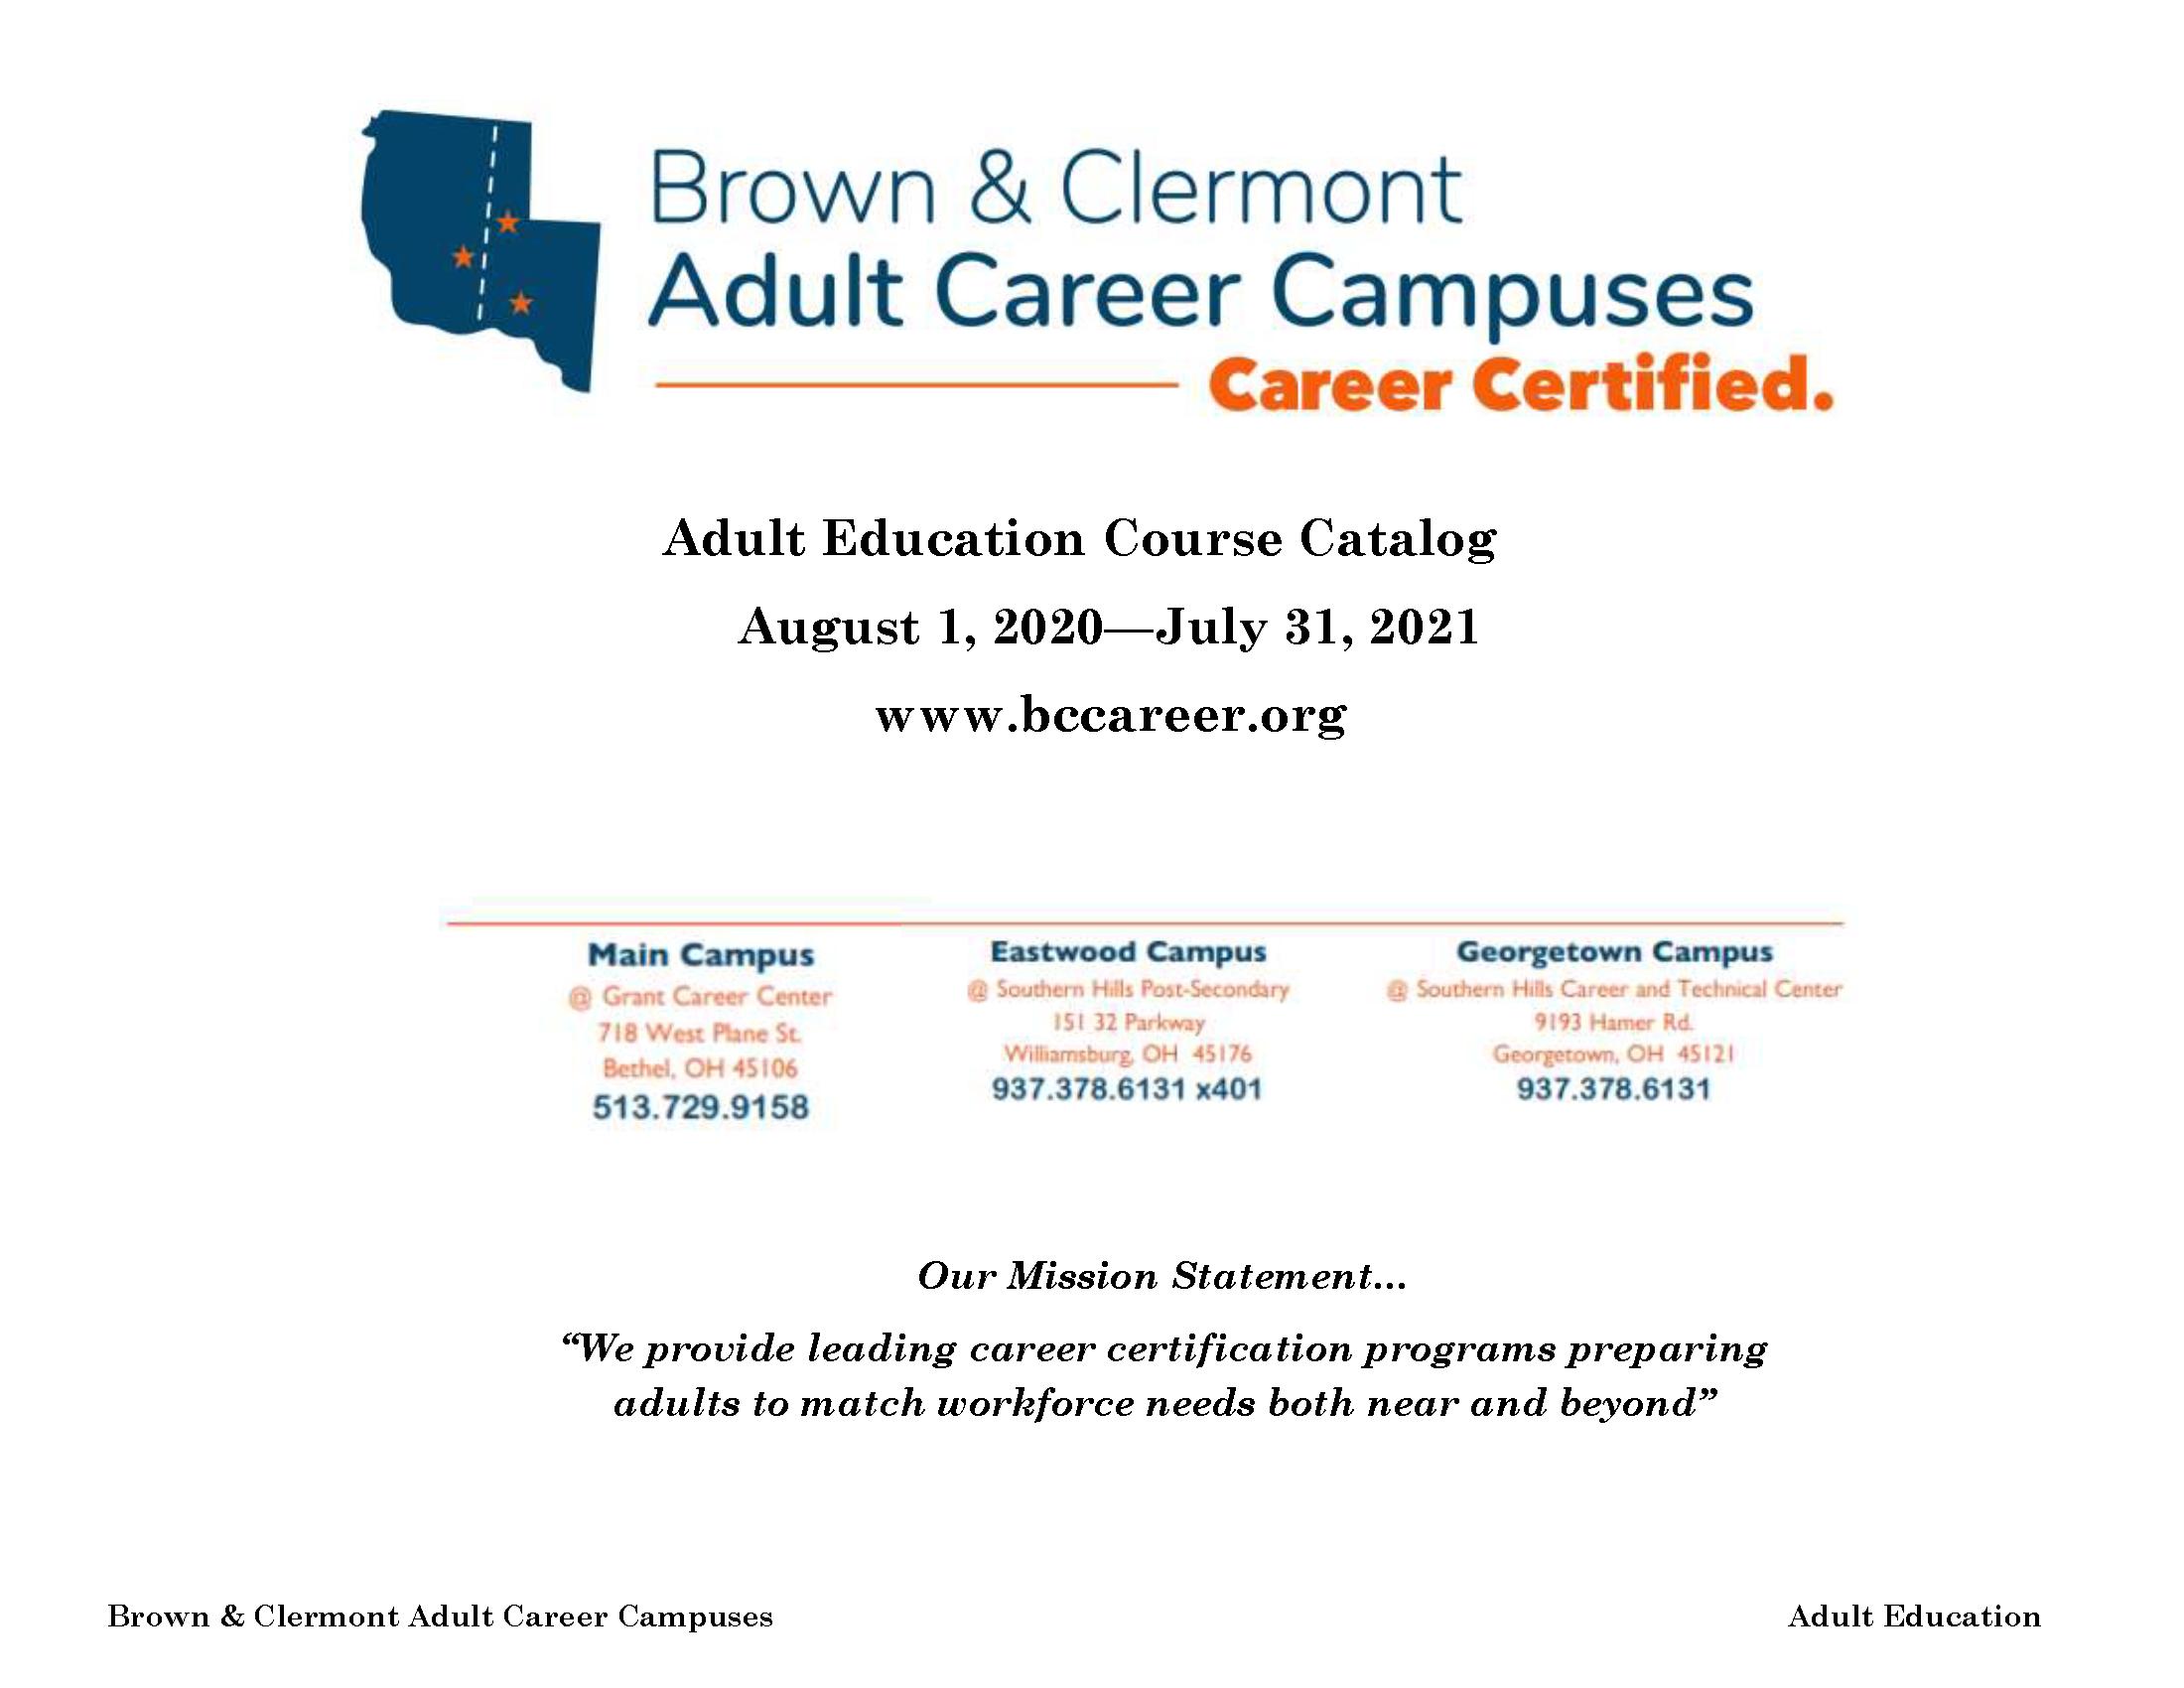 Course Catalog 2020 - 2021